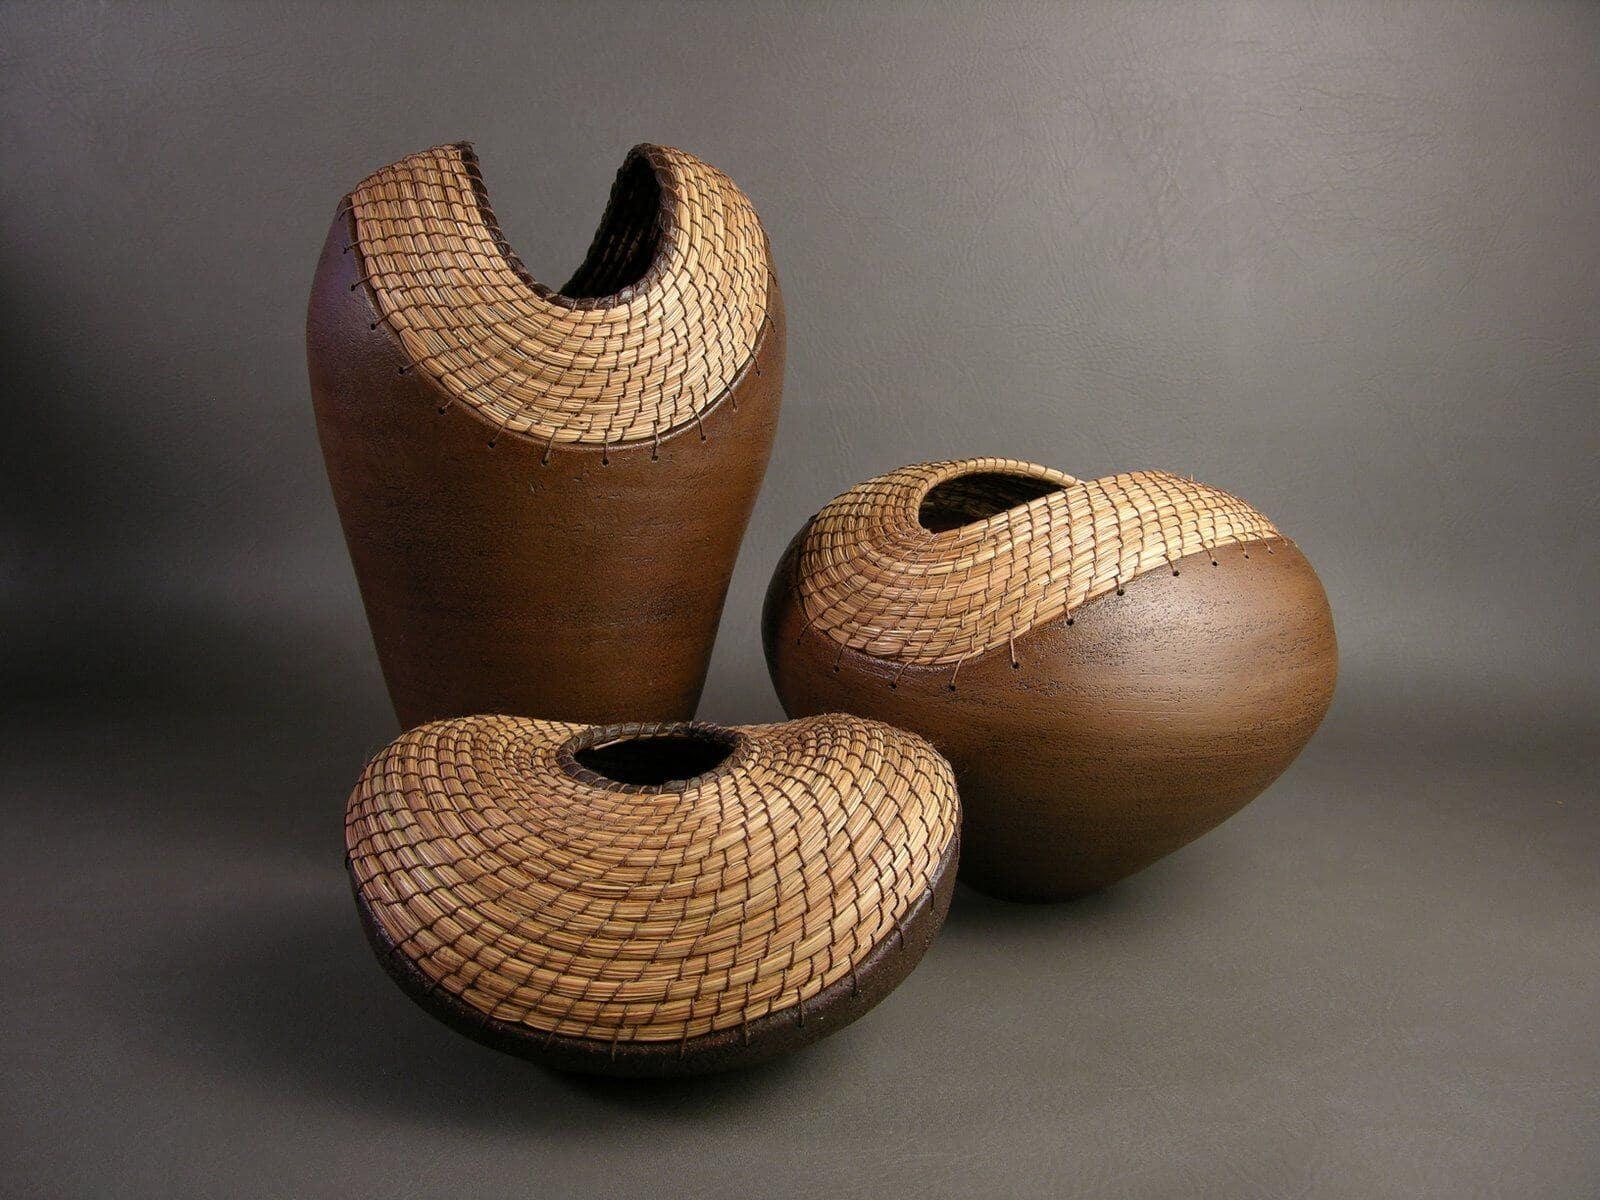 Sculptural Vessels by Janice Cormier